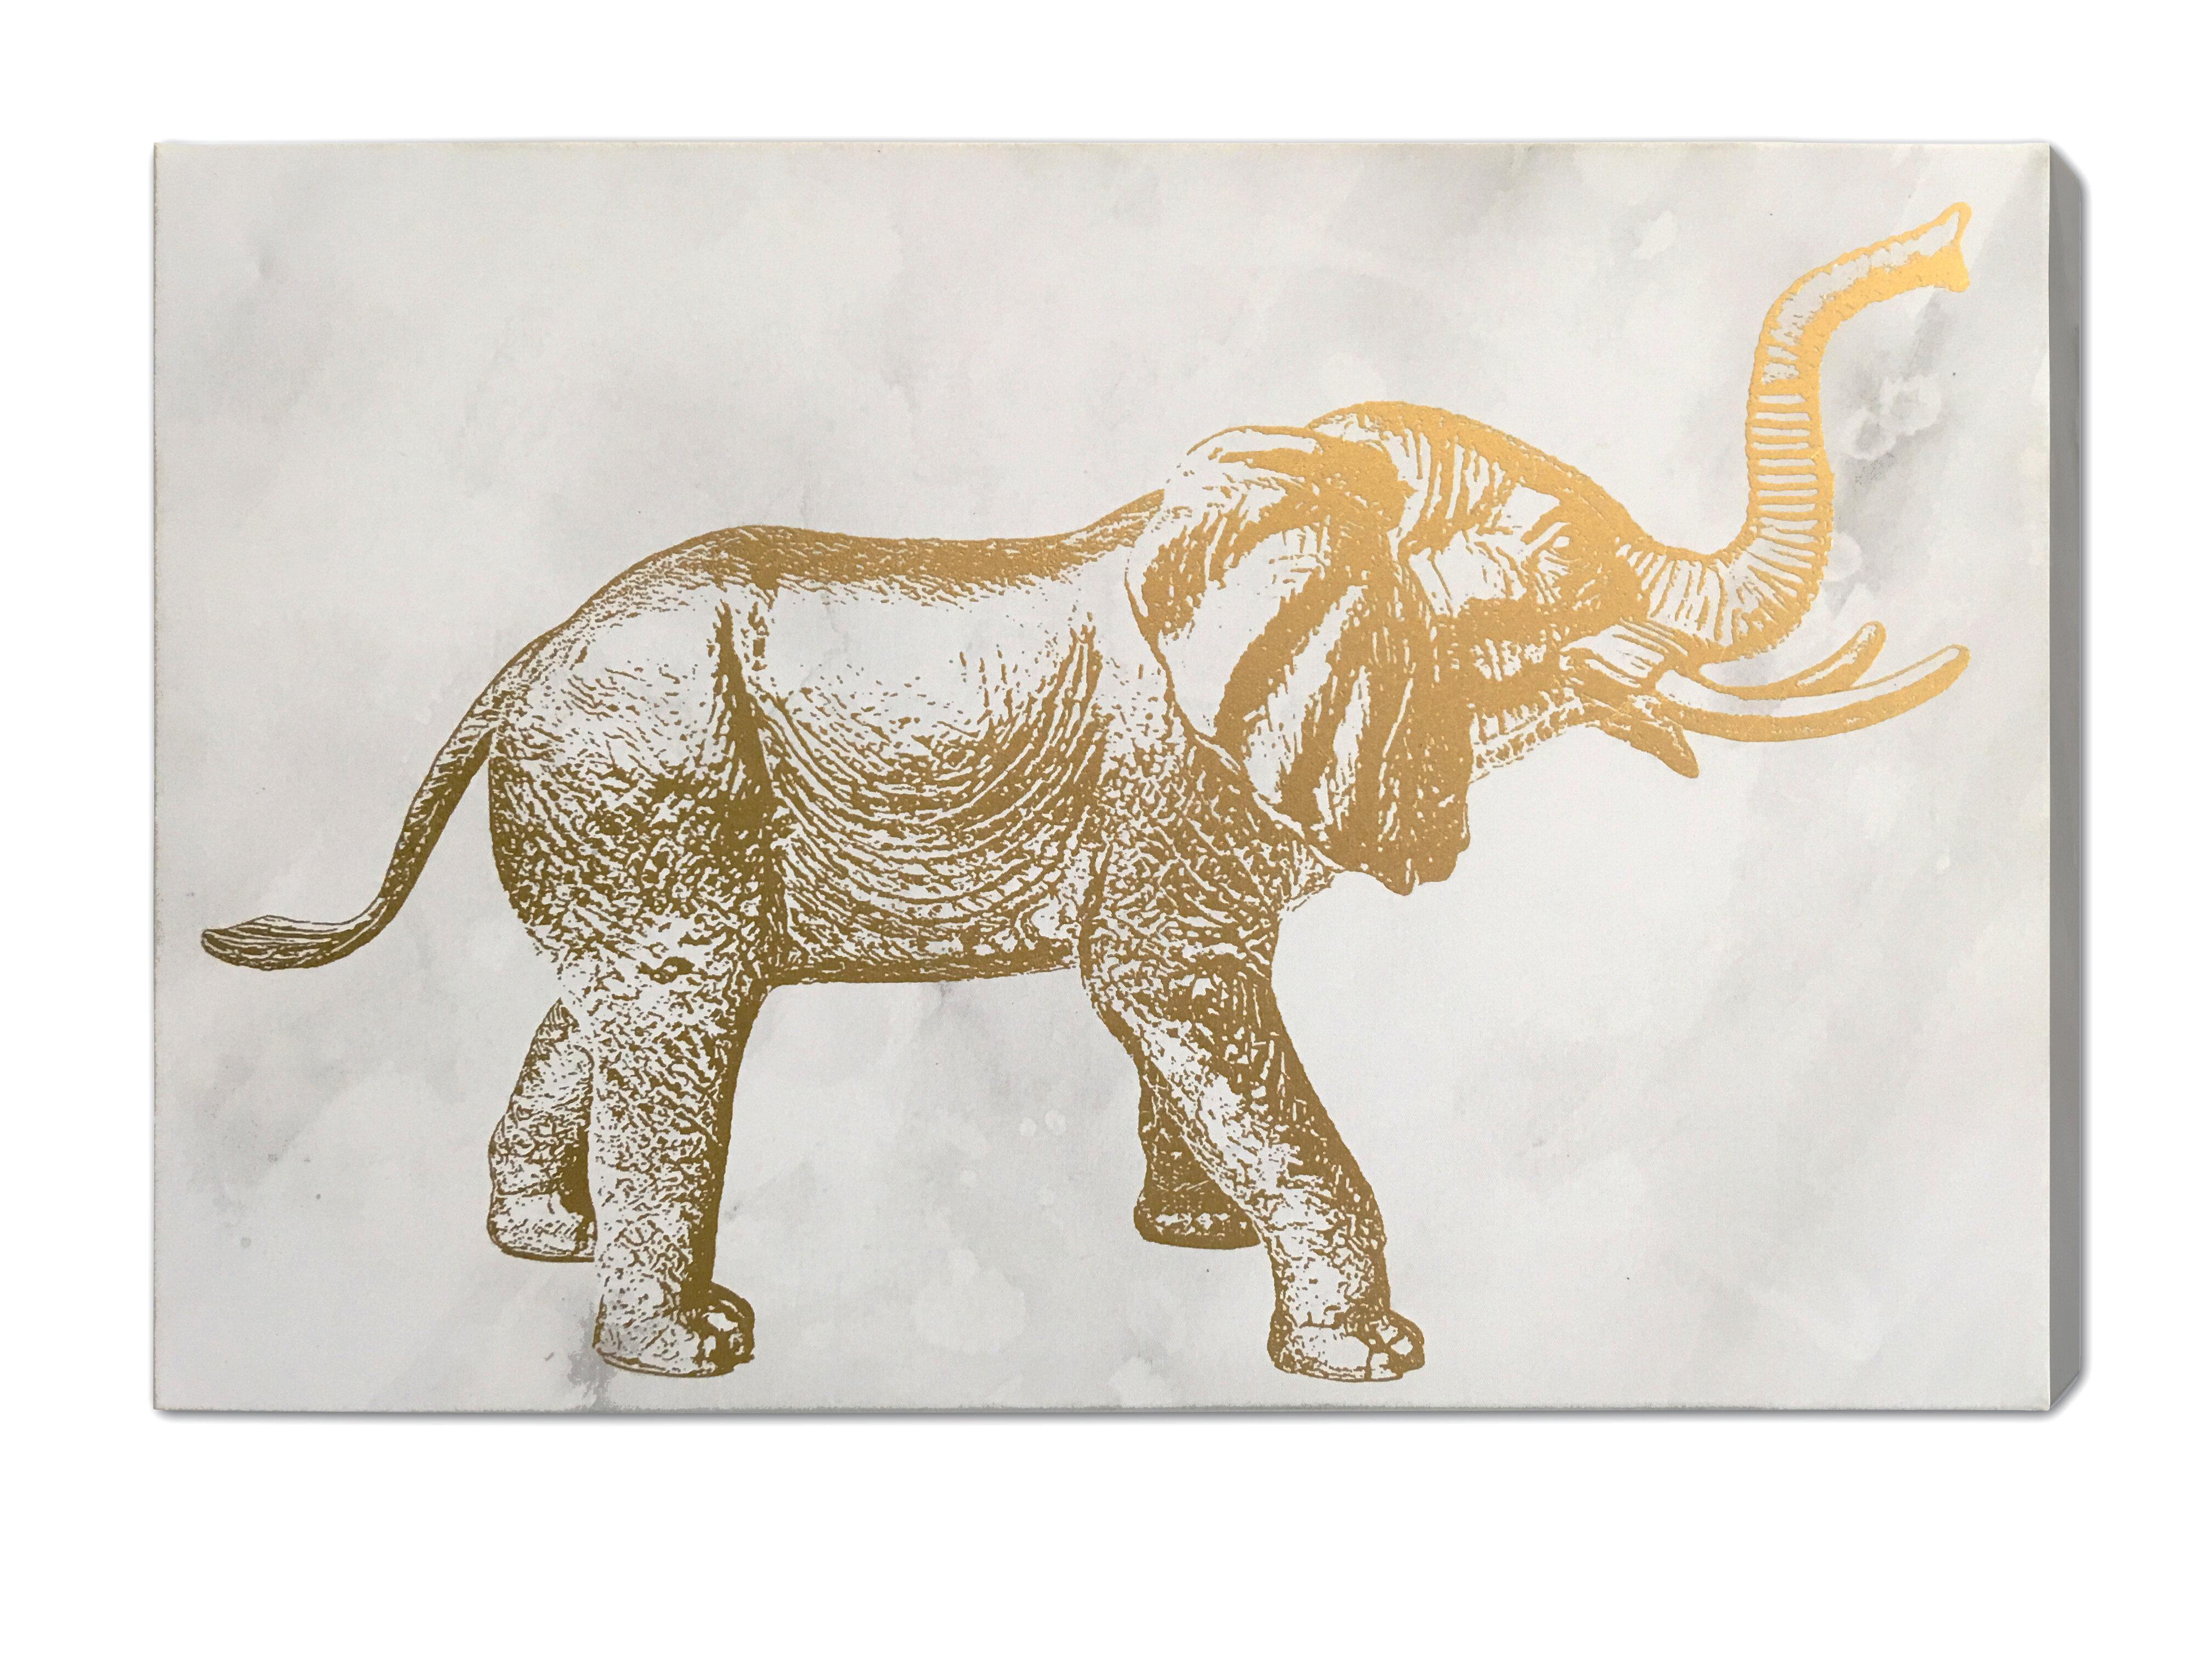 graphic canvas area art pillows wayfair willa rug elephant interiors foil decor pdx gold arlo on reviews